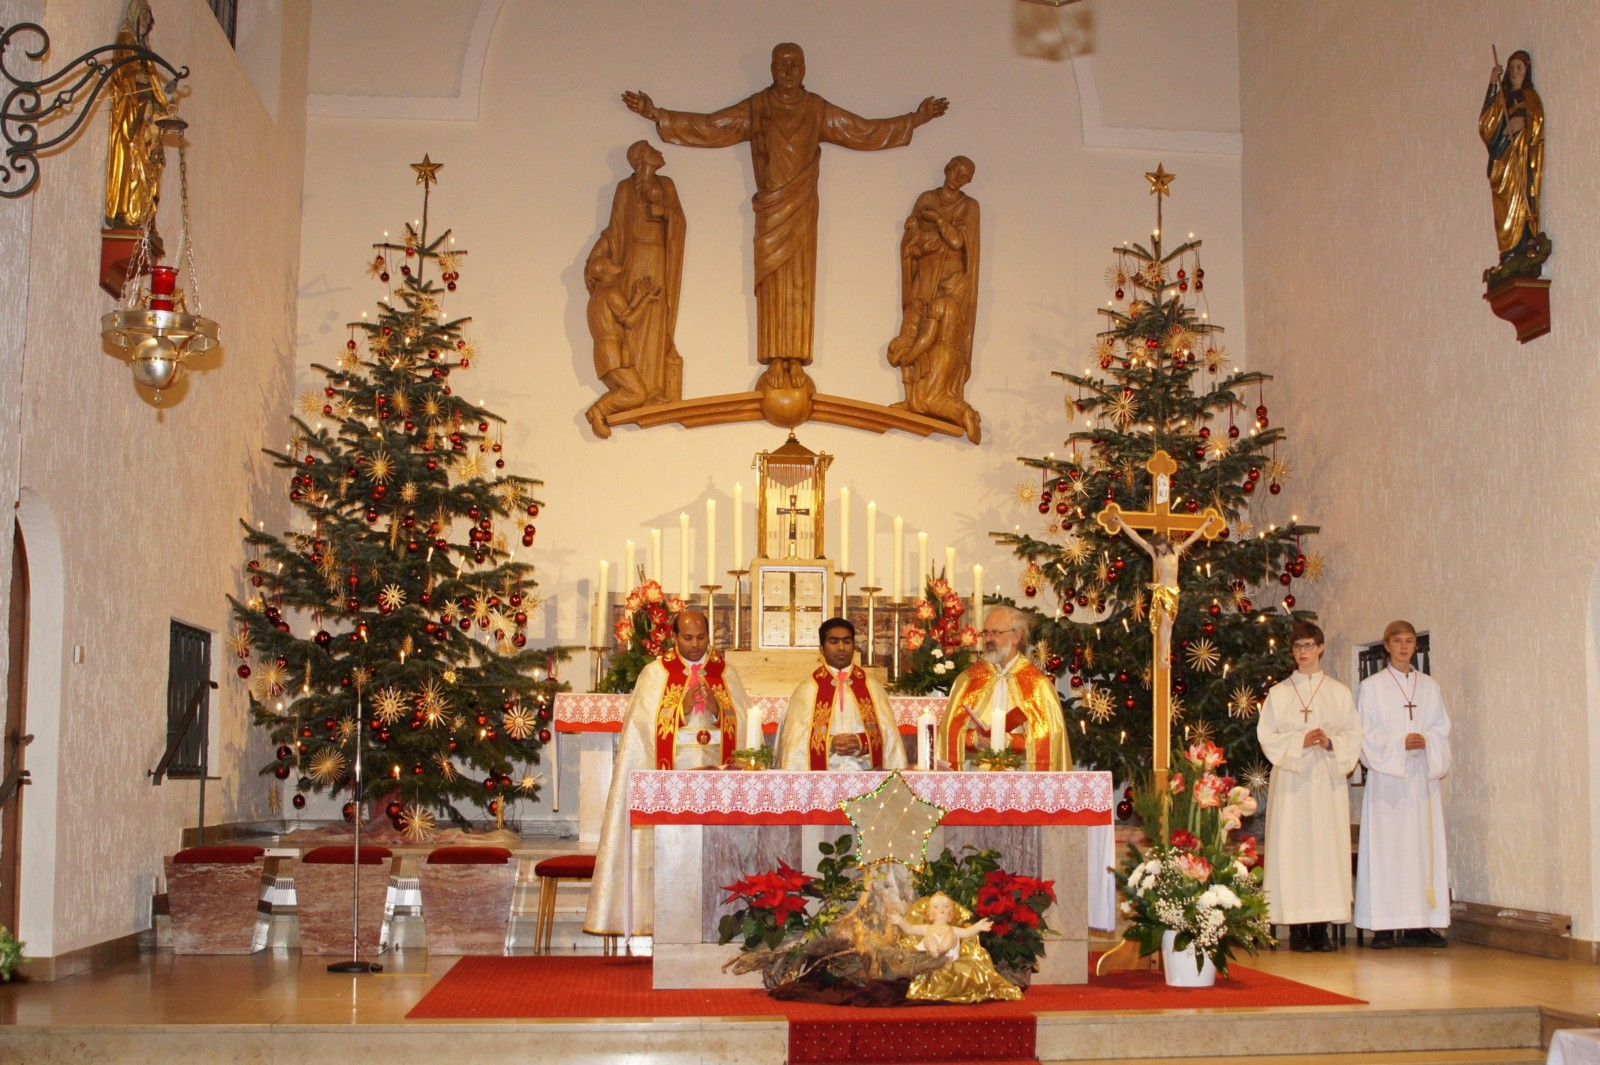 20181230-10 Jahre Priester Joseph DSC03754